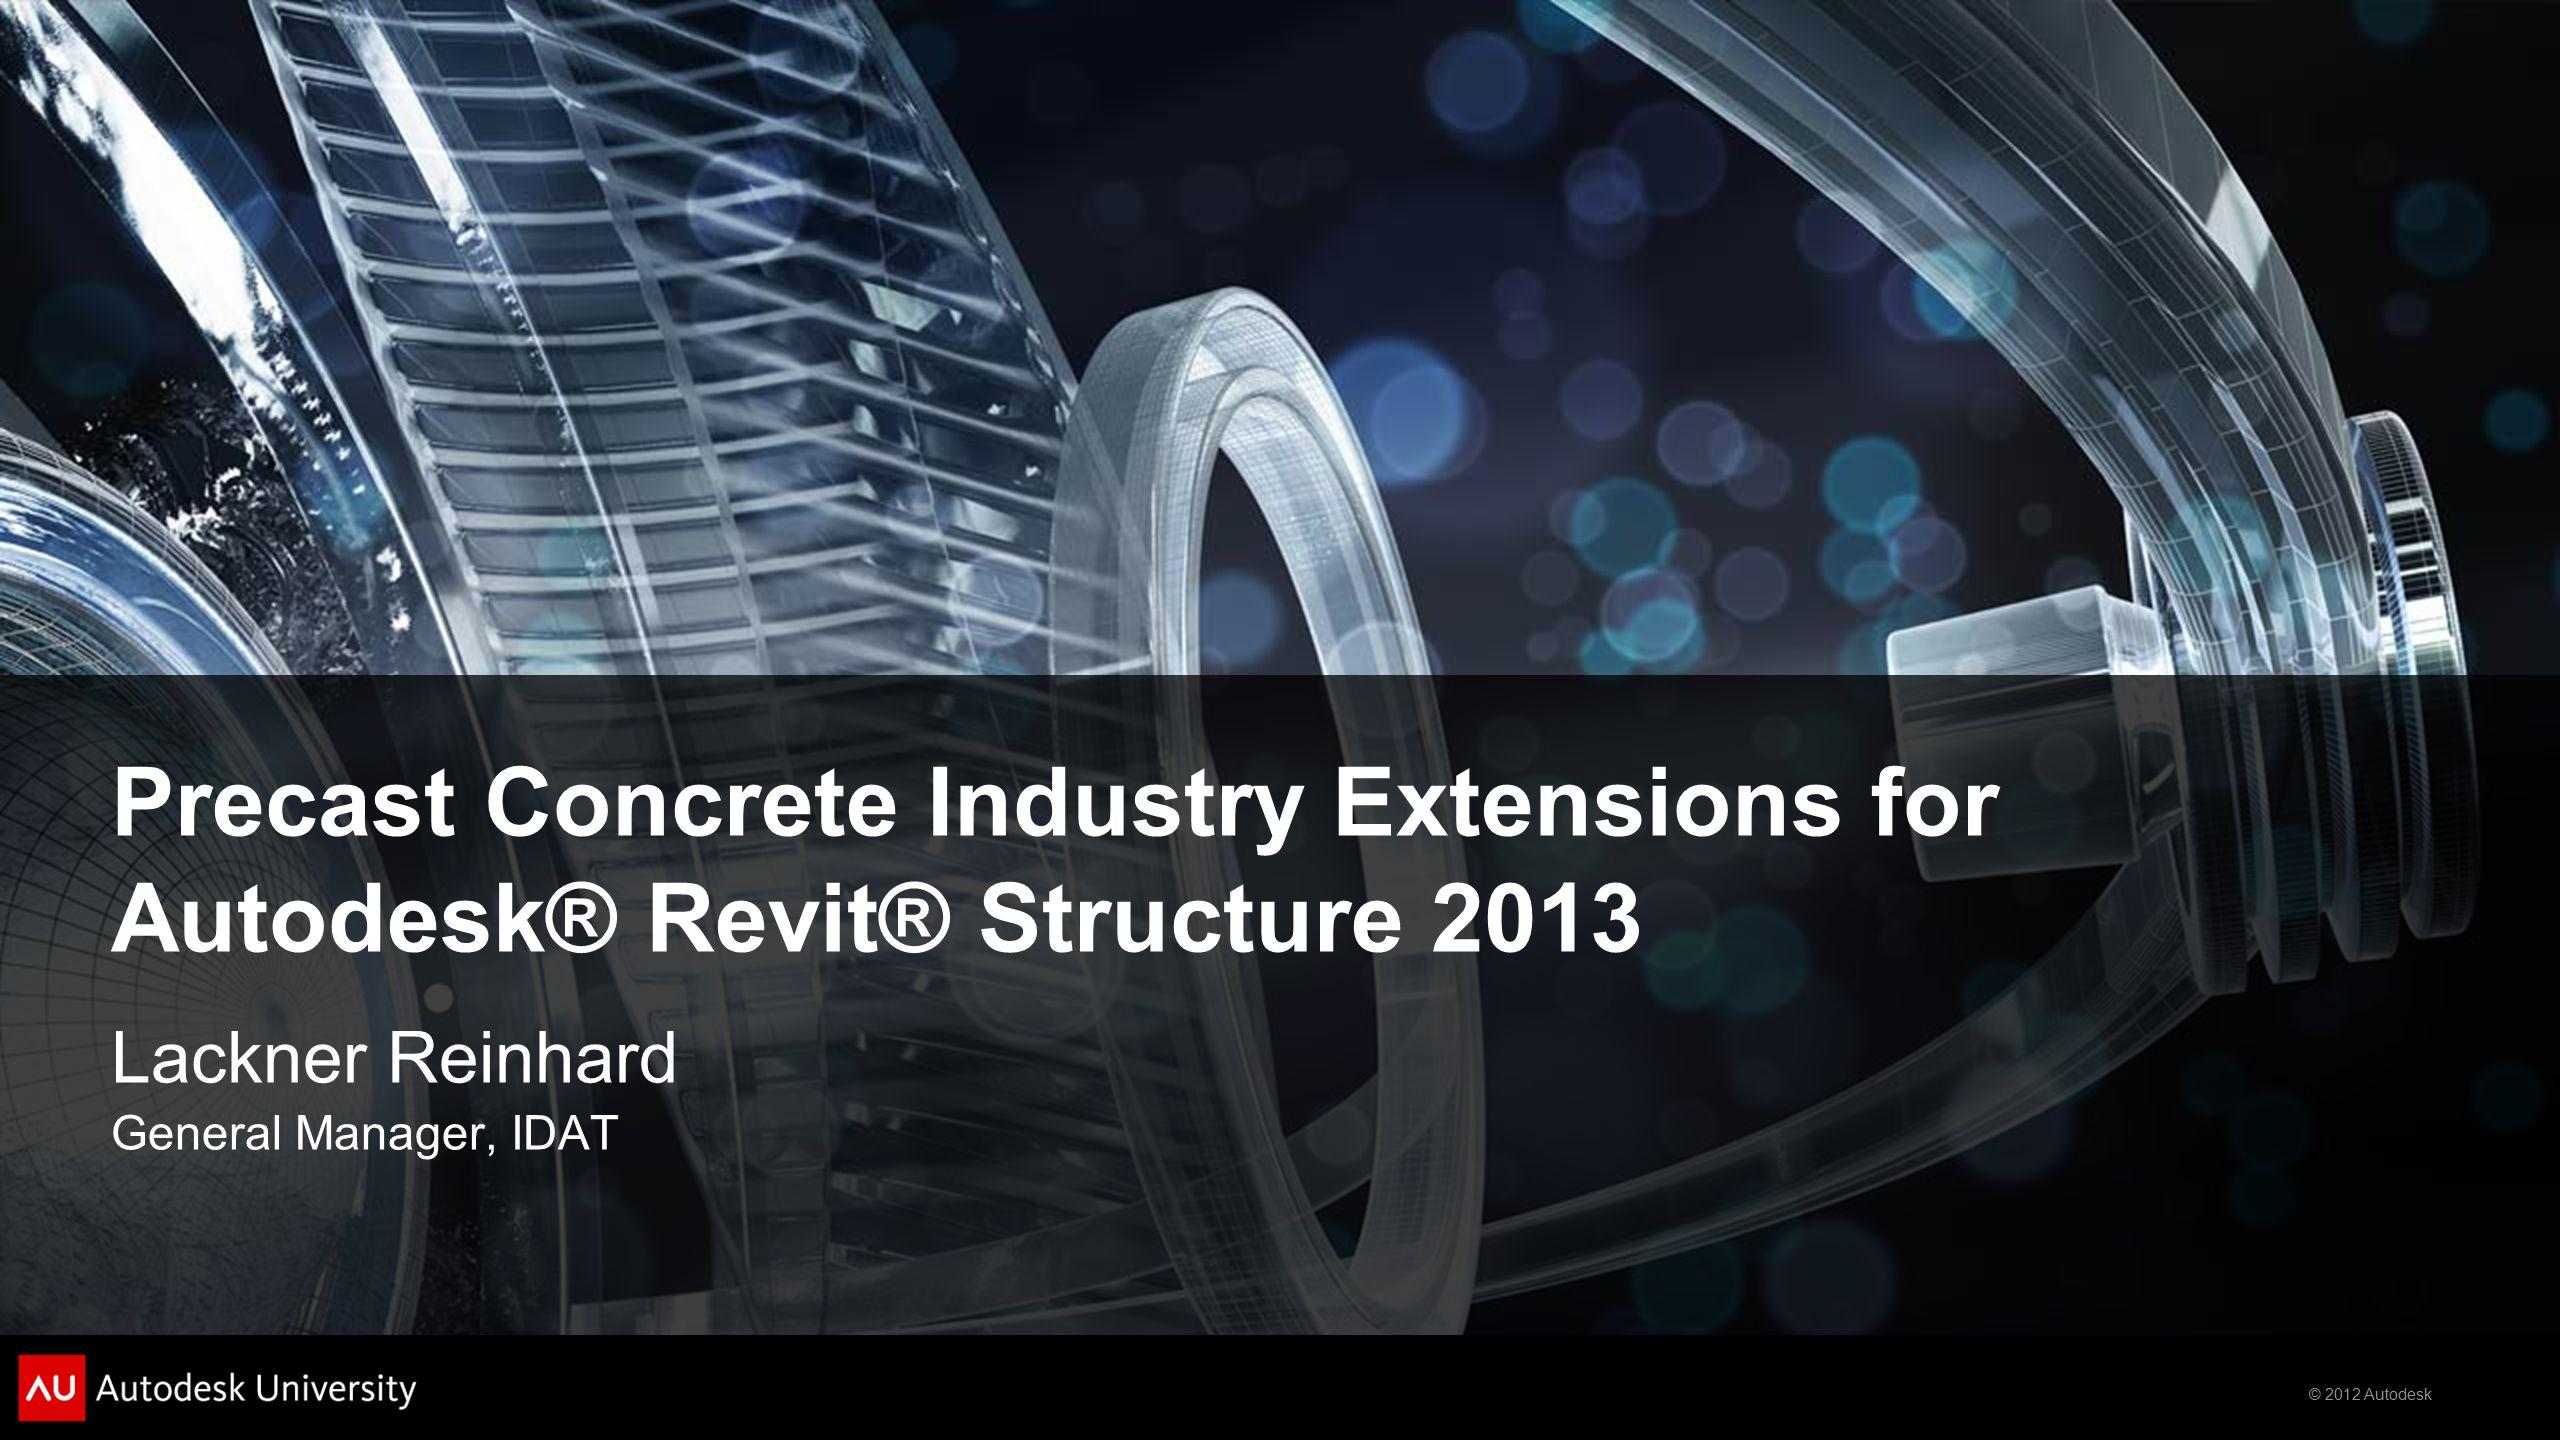 Precast Concrete Industry Extensions for Autodesk® Revit® Structure 2013  Lackner Reinhard General Manager, IDAT